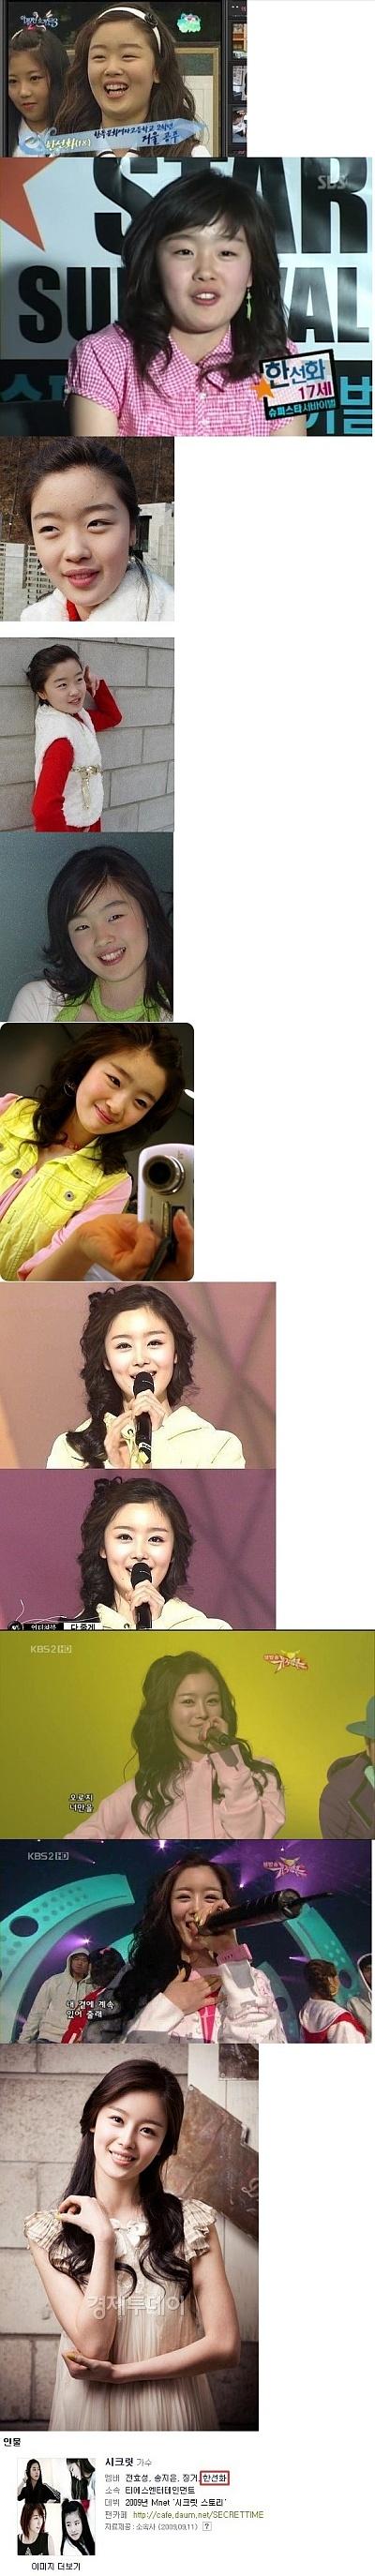 http://sookyeong.files.wordpress.com/2009/12/file_down7.jpg